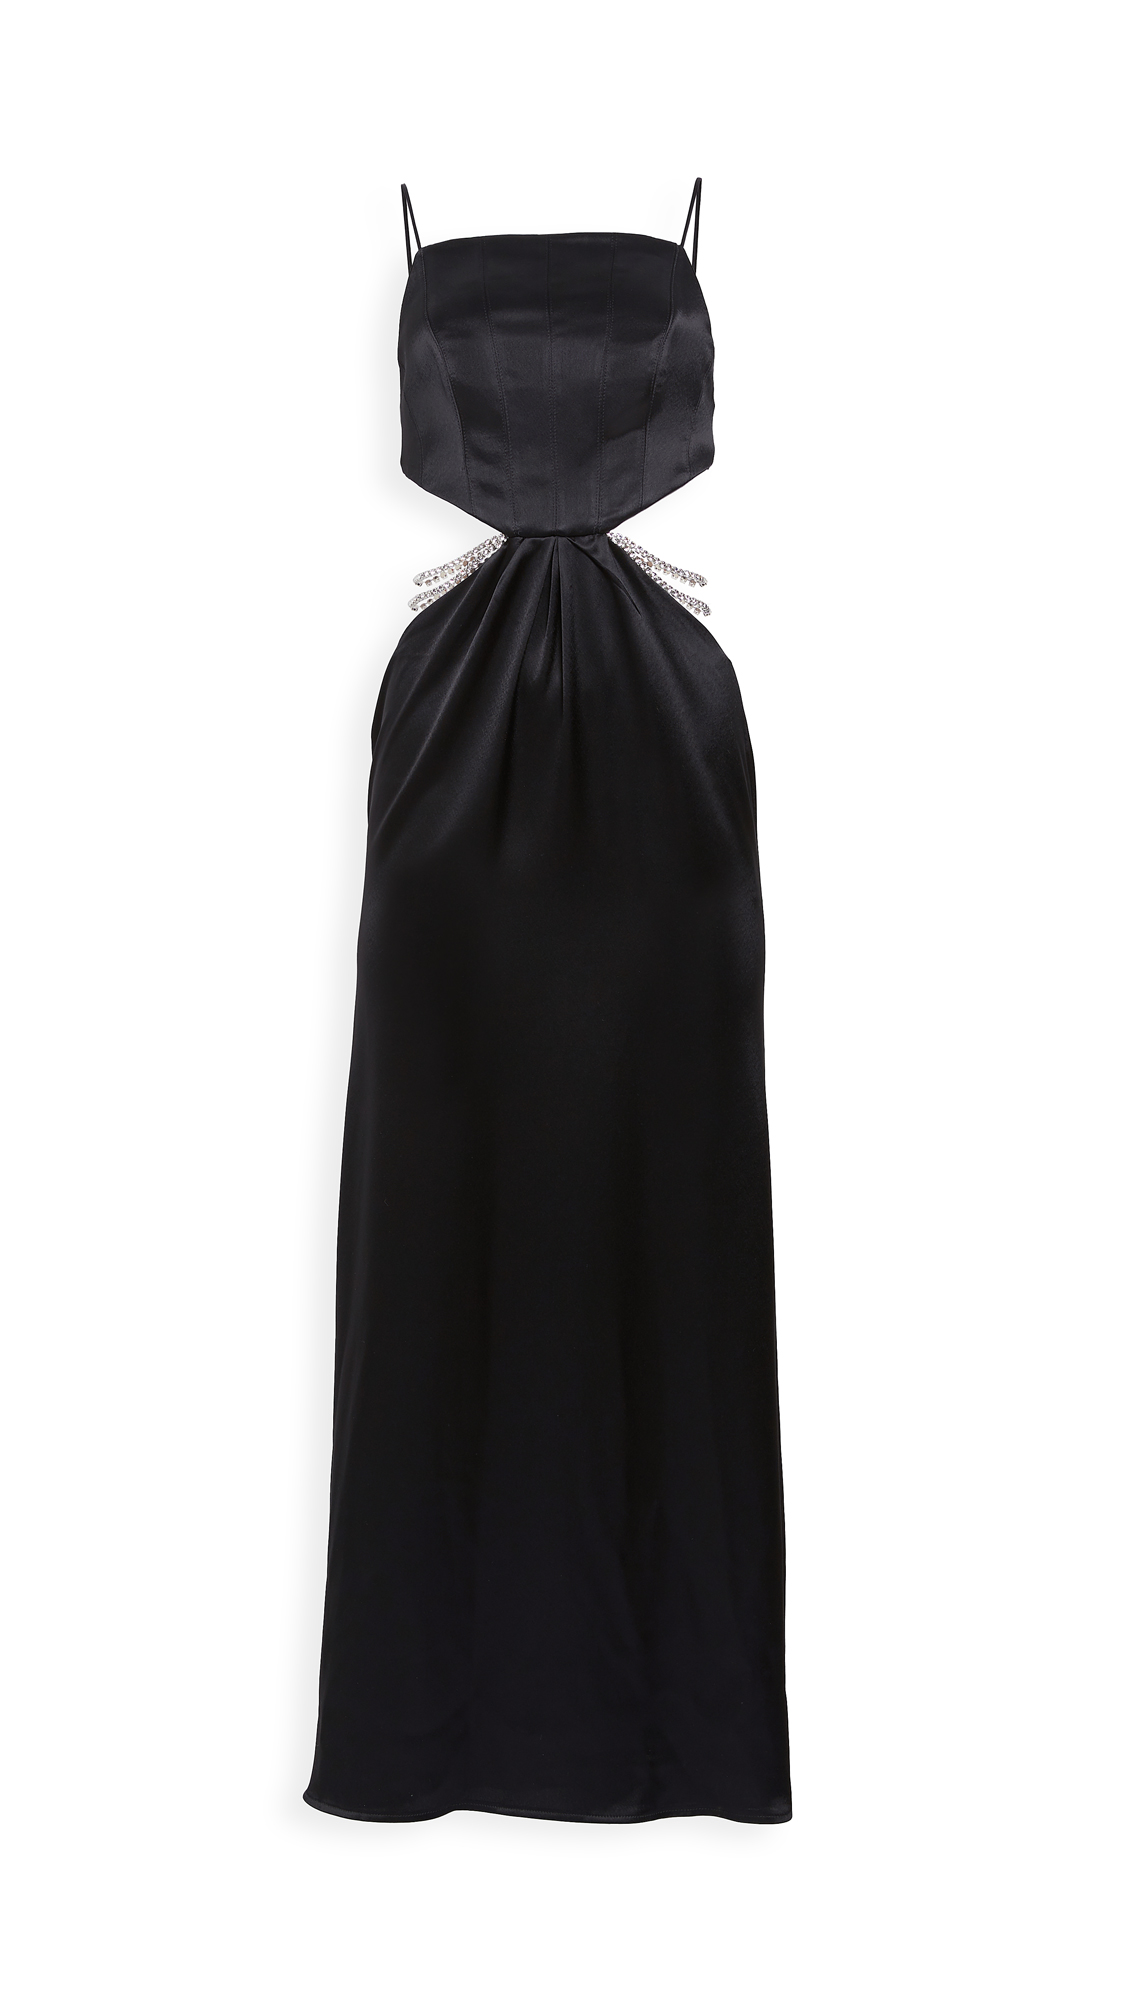 Nafsika Skourti Carla Dress Long - 50% Off Sale